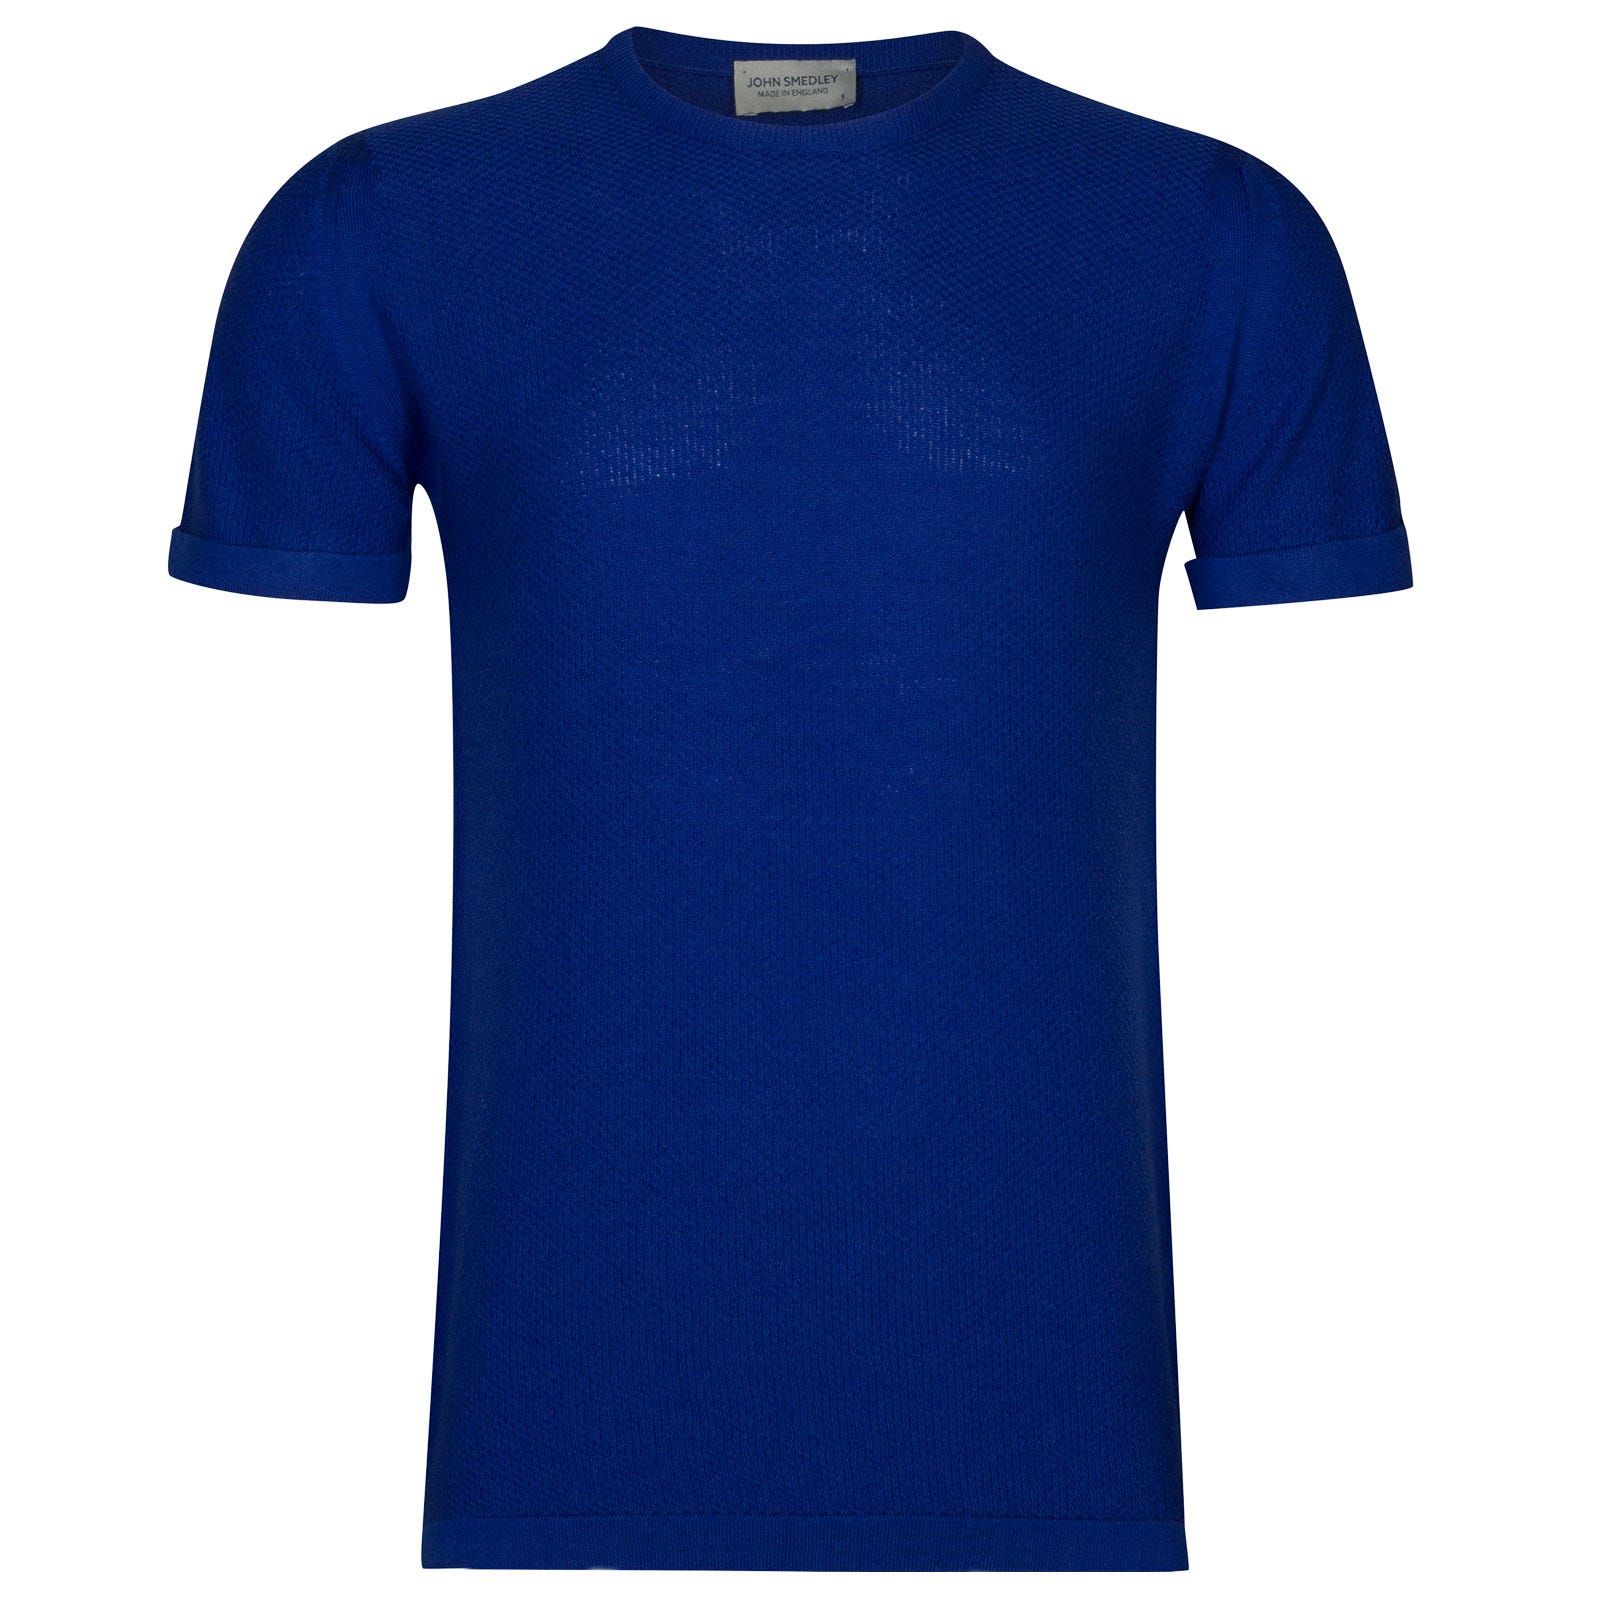 John Smedley 2Singular Merino Wool T-Shirt in Coniston Blue-L